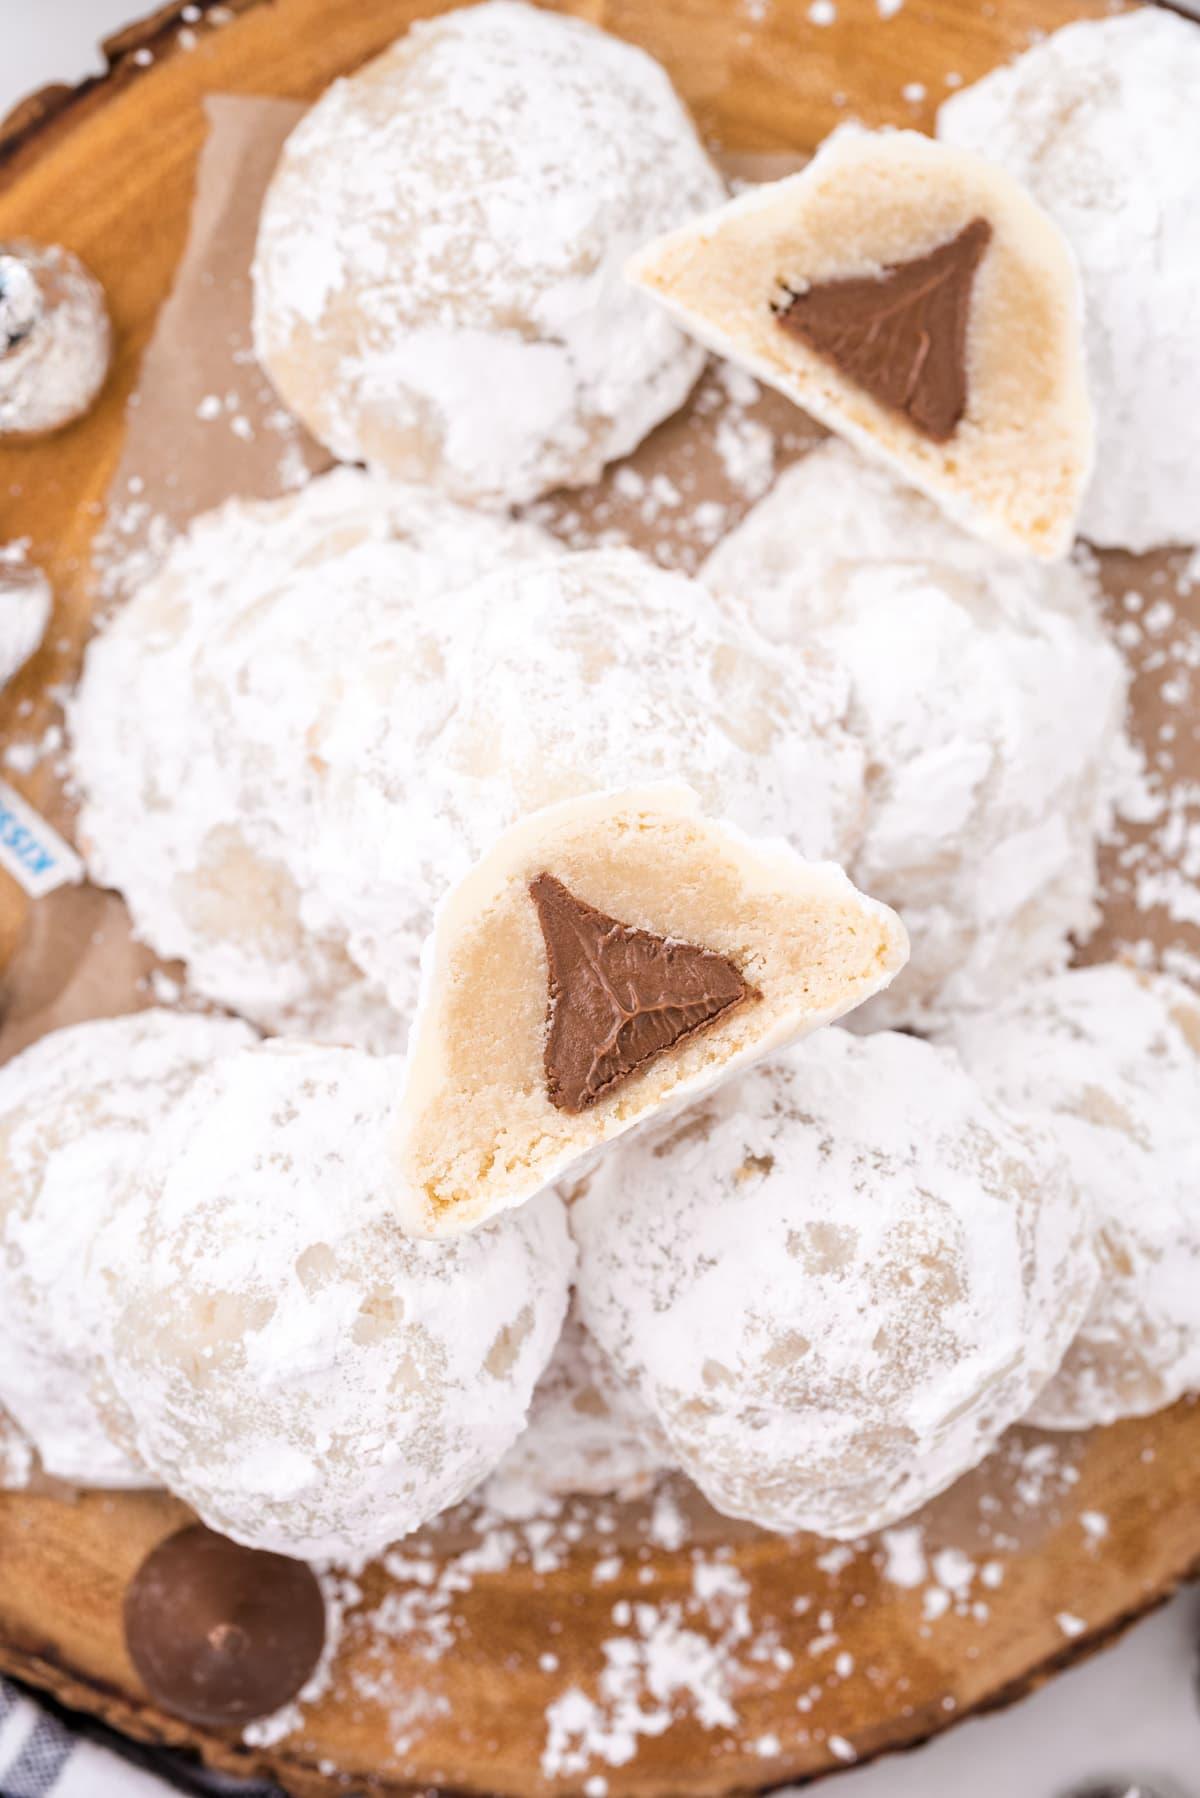 secret kiss cookies cut in half